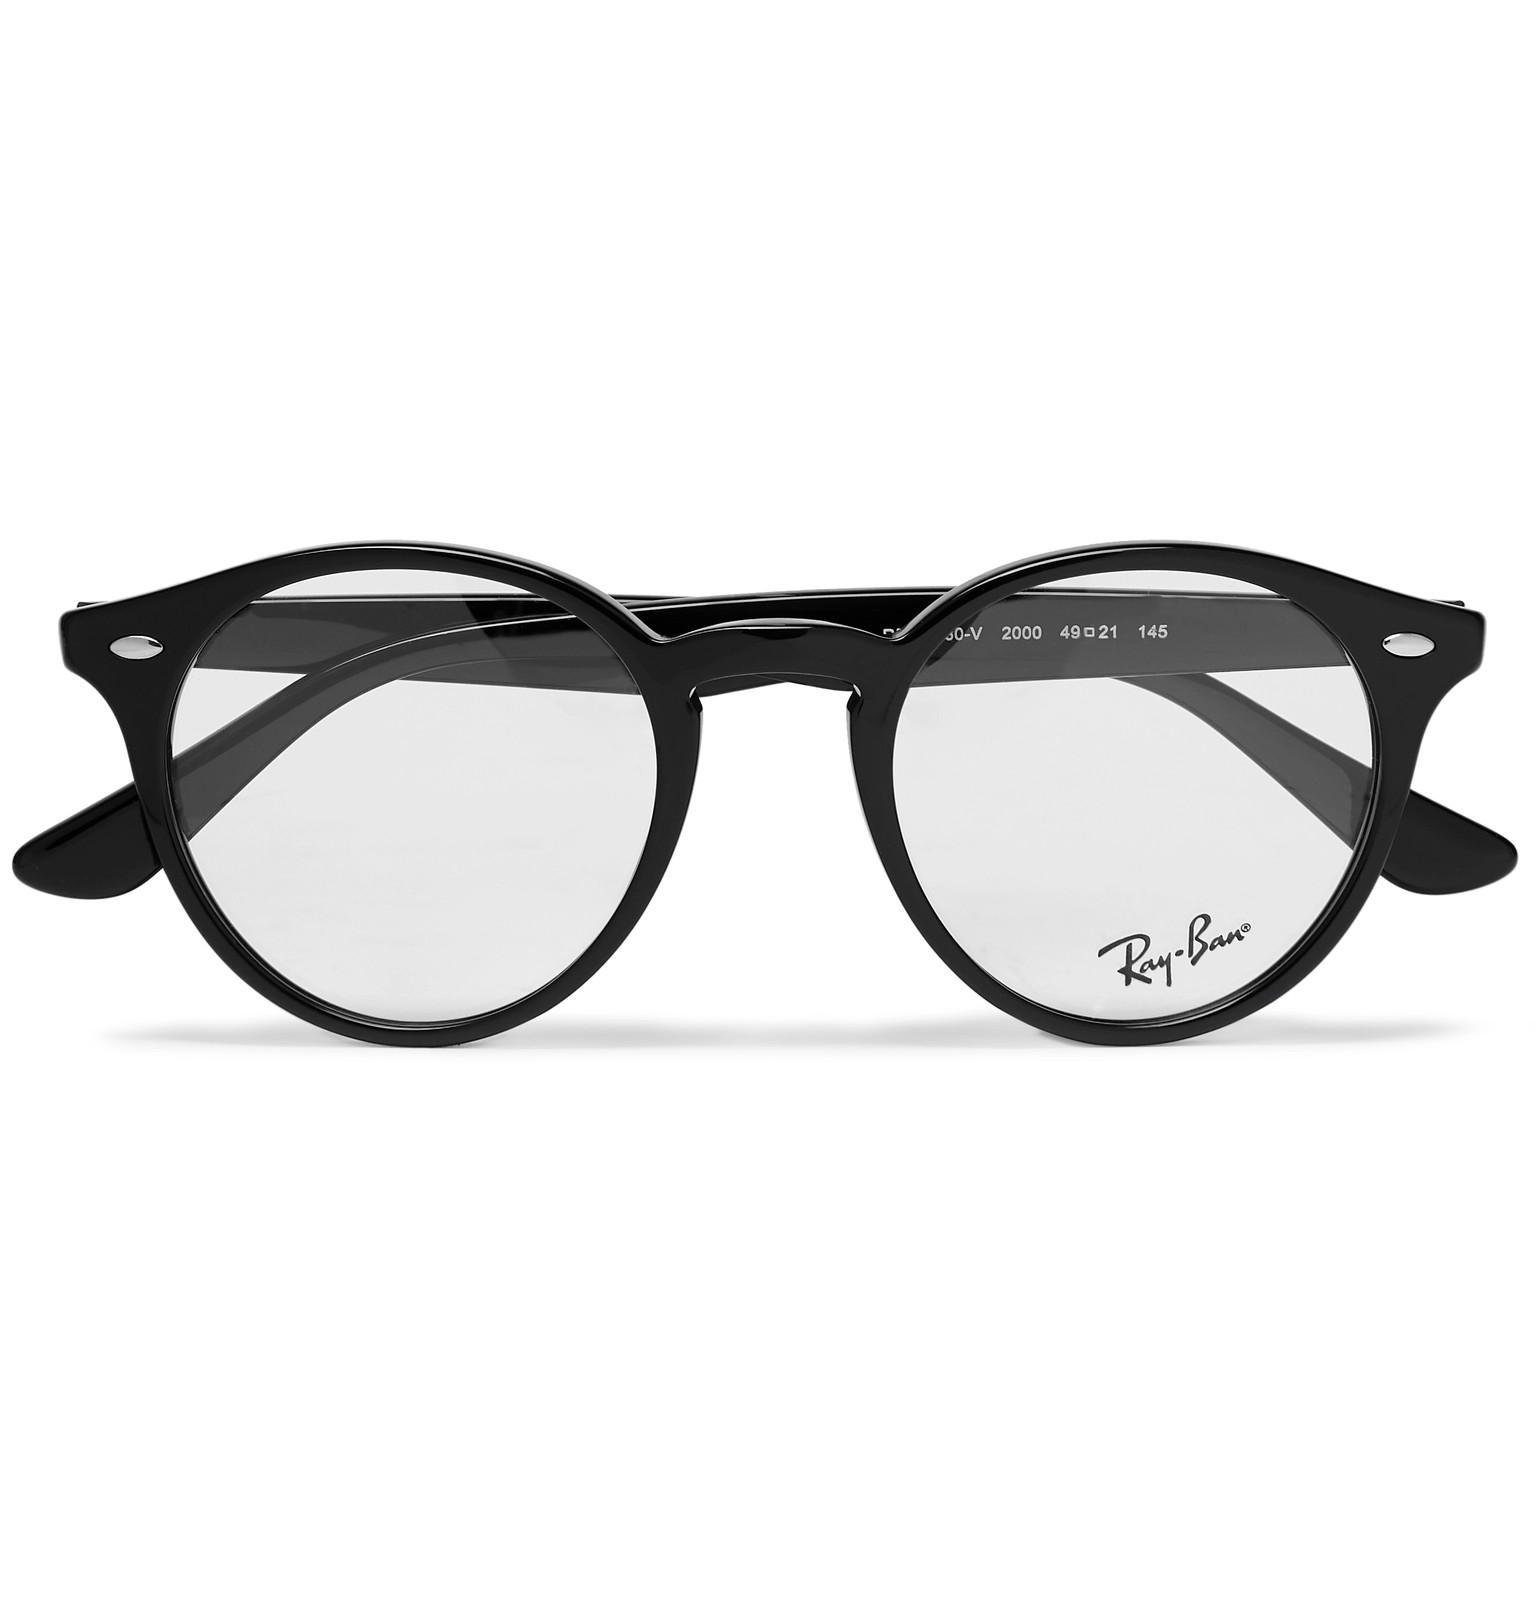 4a602fec9b Ray-Ban. Men s Black Round-frame Acetate Optical Glasses.  160 From MR  PORTER ...